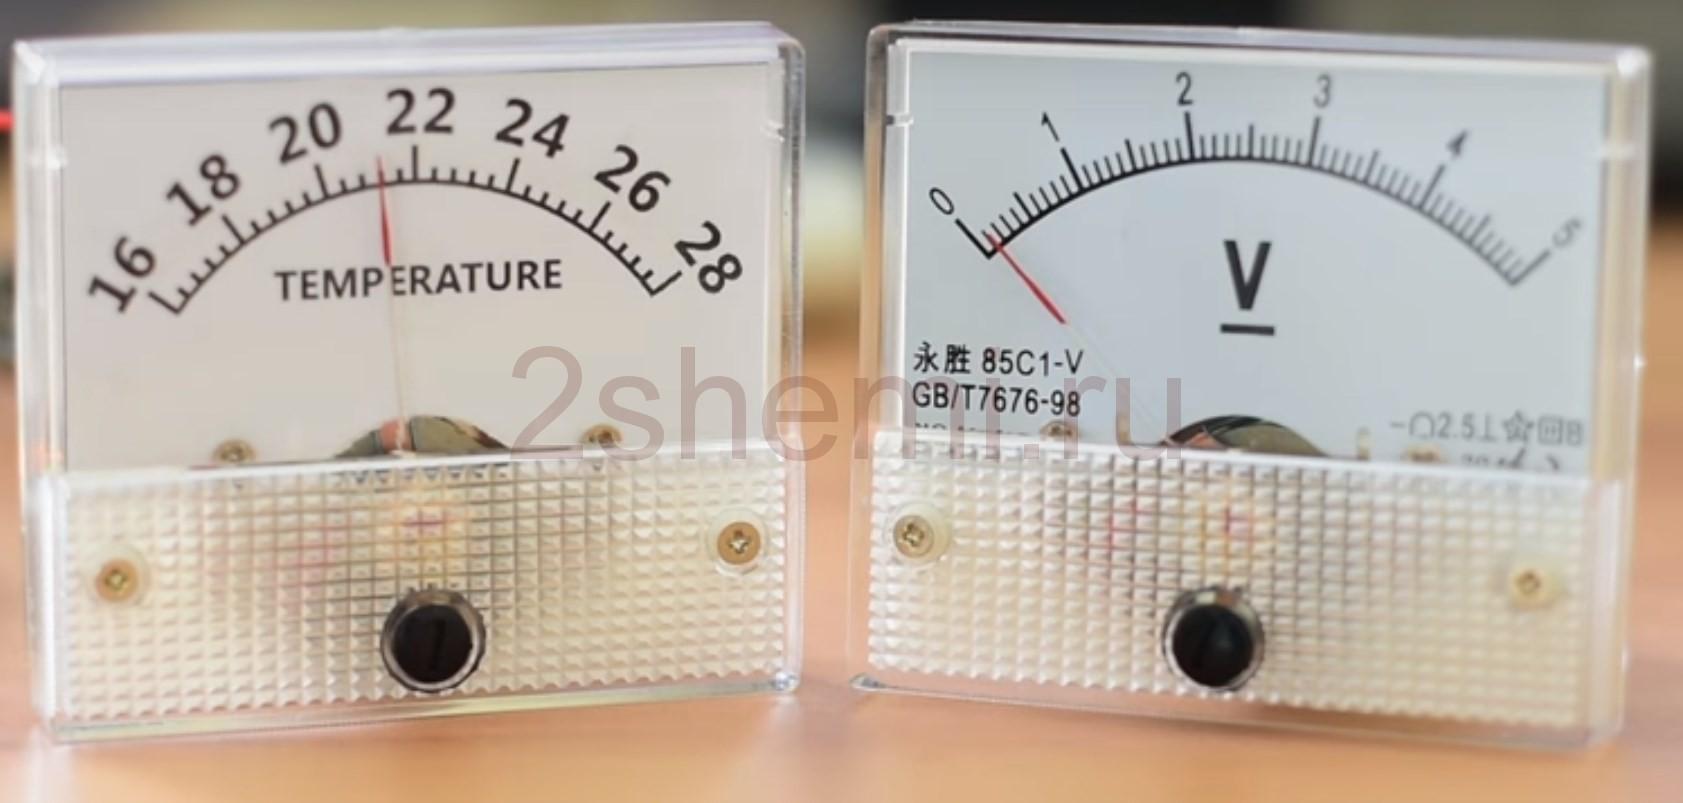 Термометр со стрелочным индикатором на микроконтроллере Ардуино